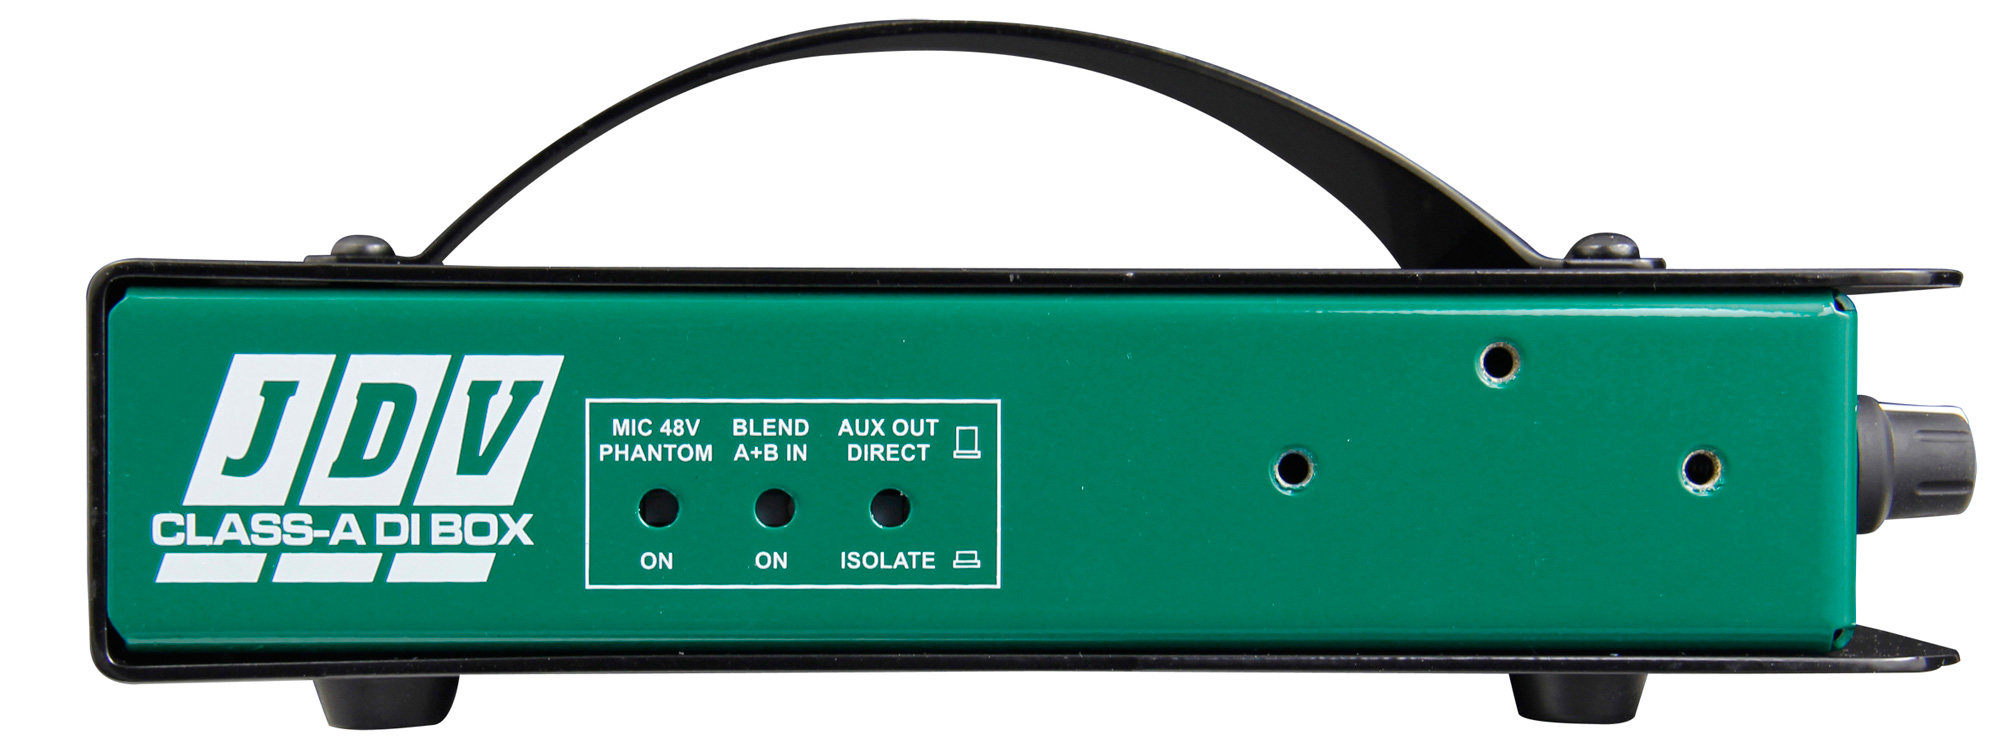 Radial JDV Mk5 Super DI - Active Class-A Direct Box